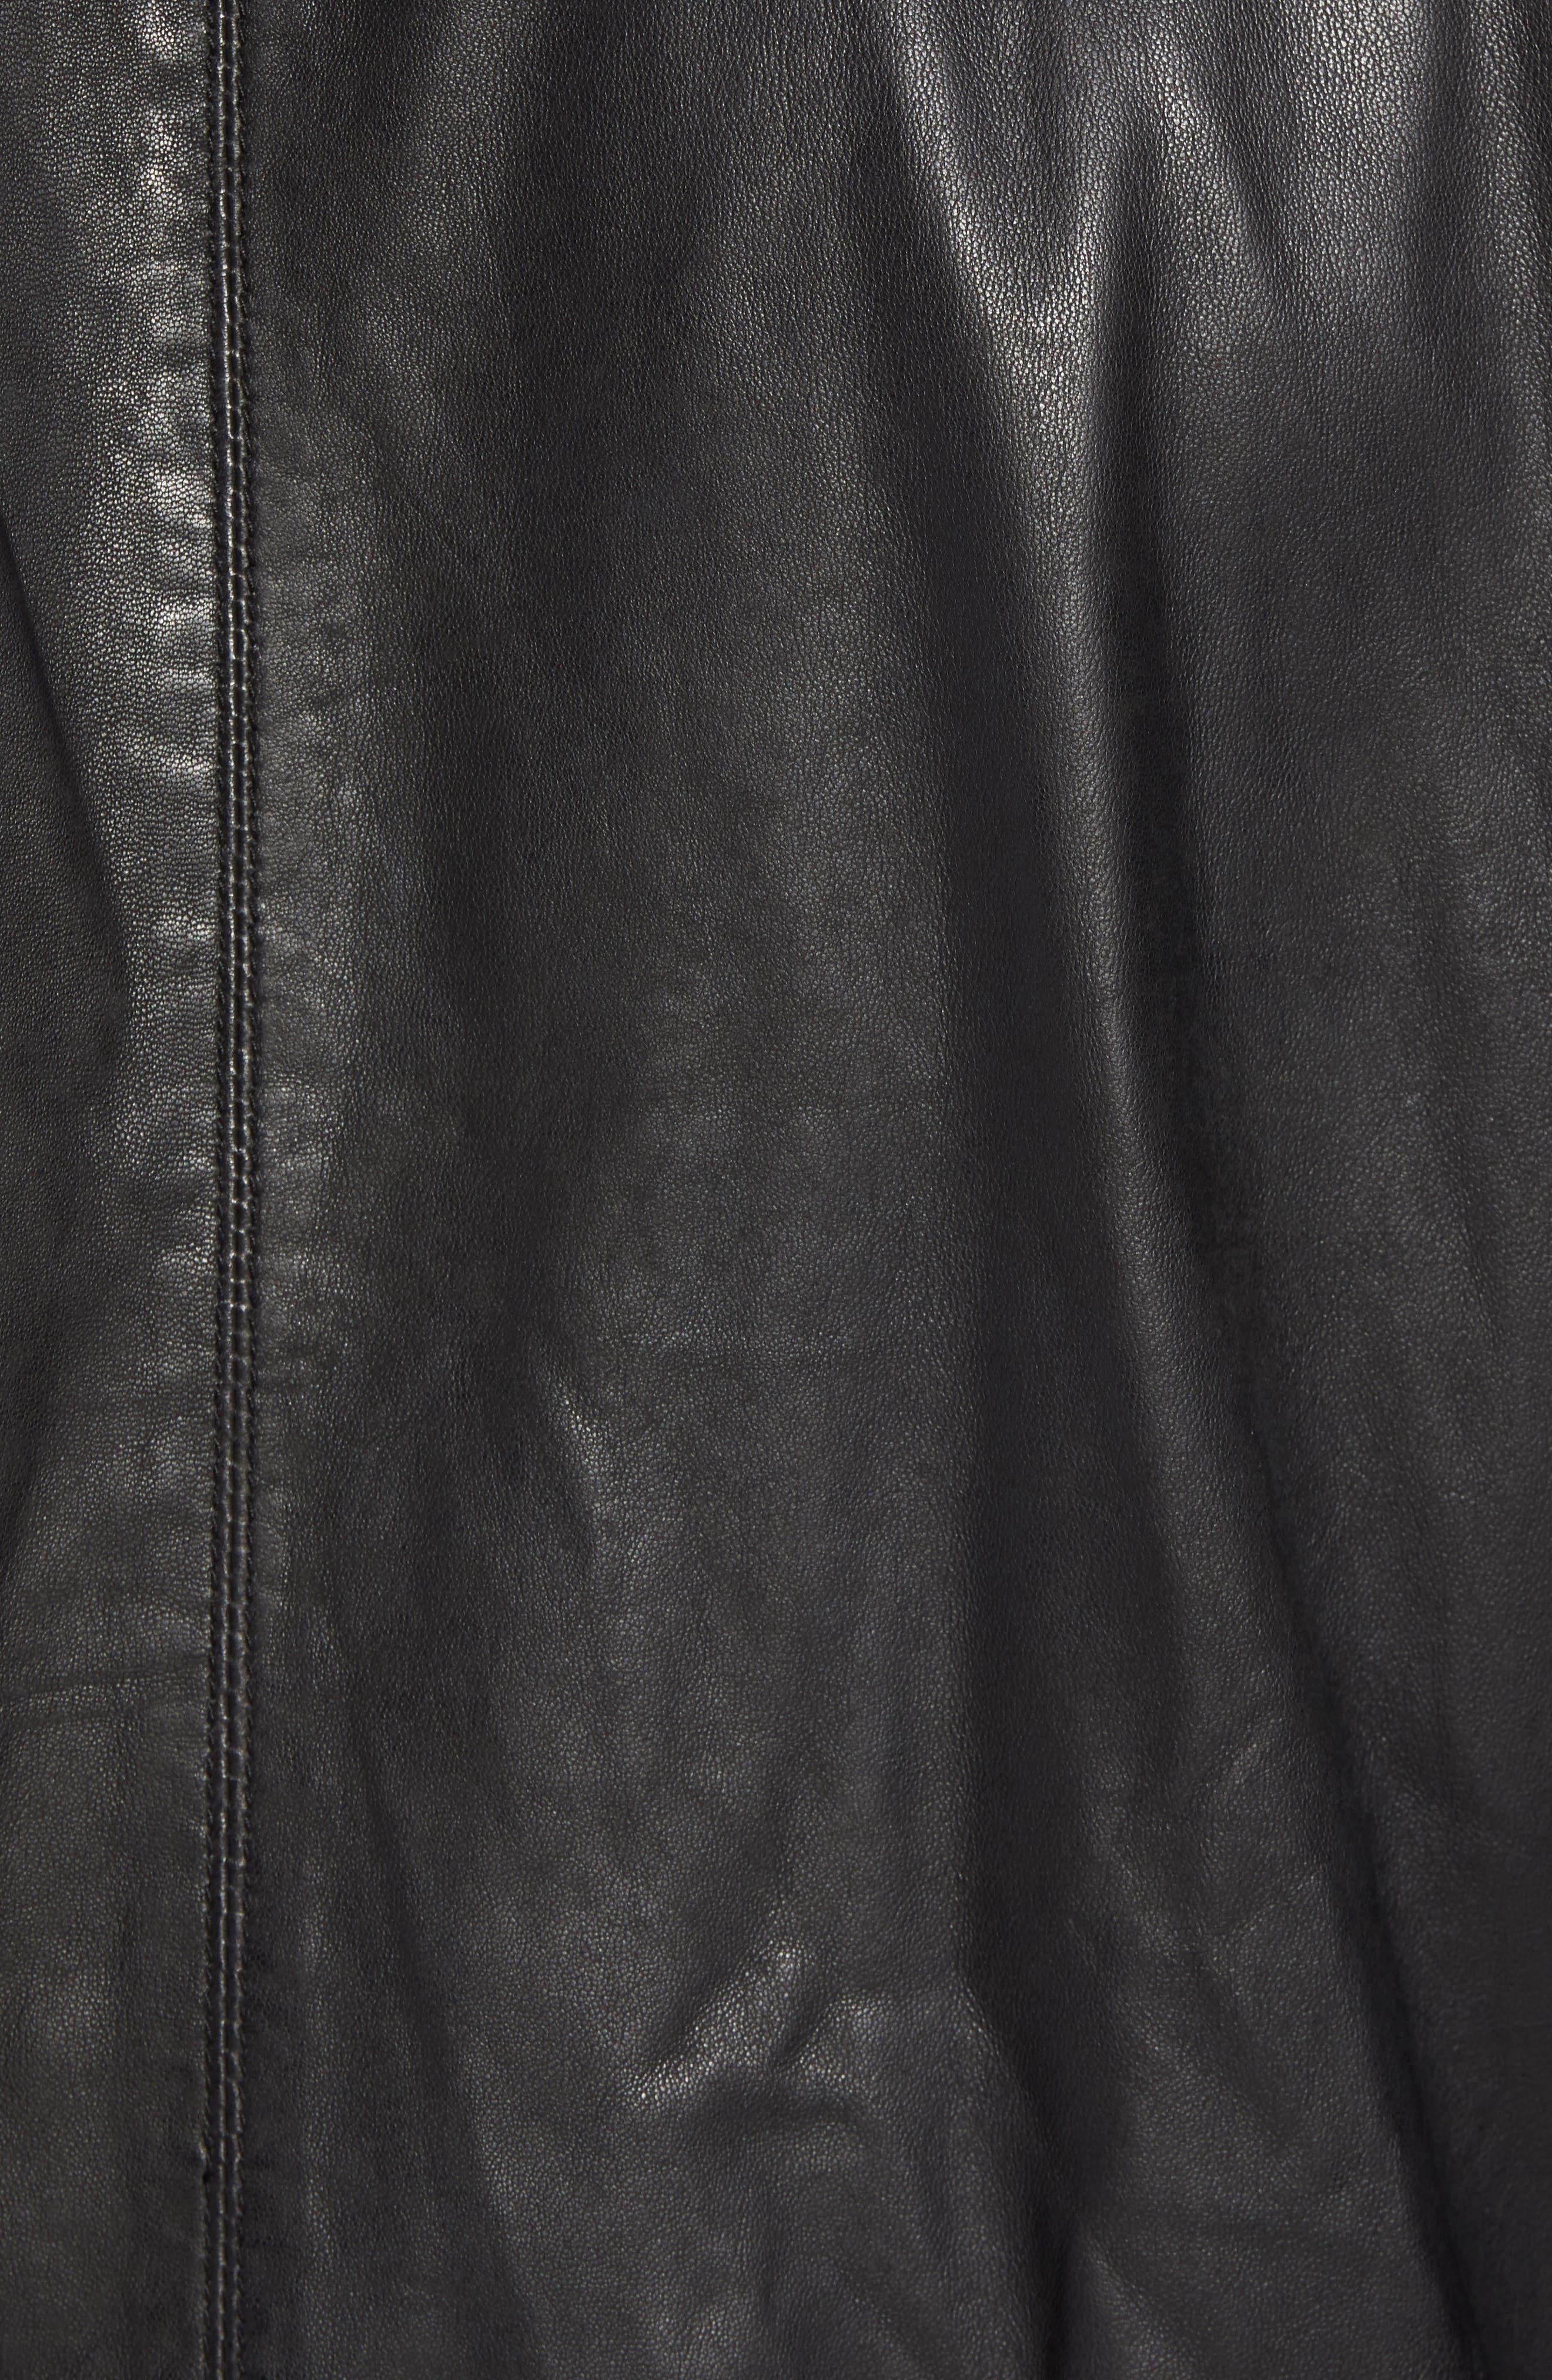 Hudson Leather Bomber Jacket,                             Alternate thumbnail 6, color,                             001